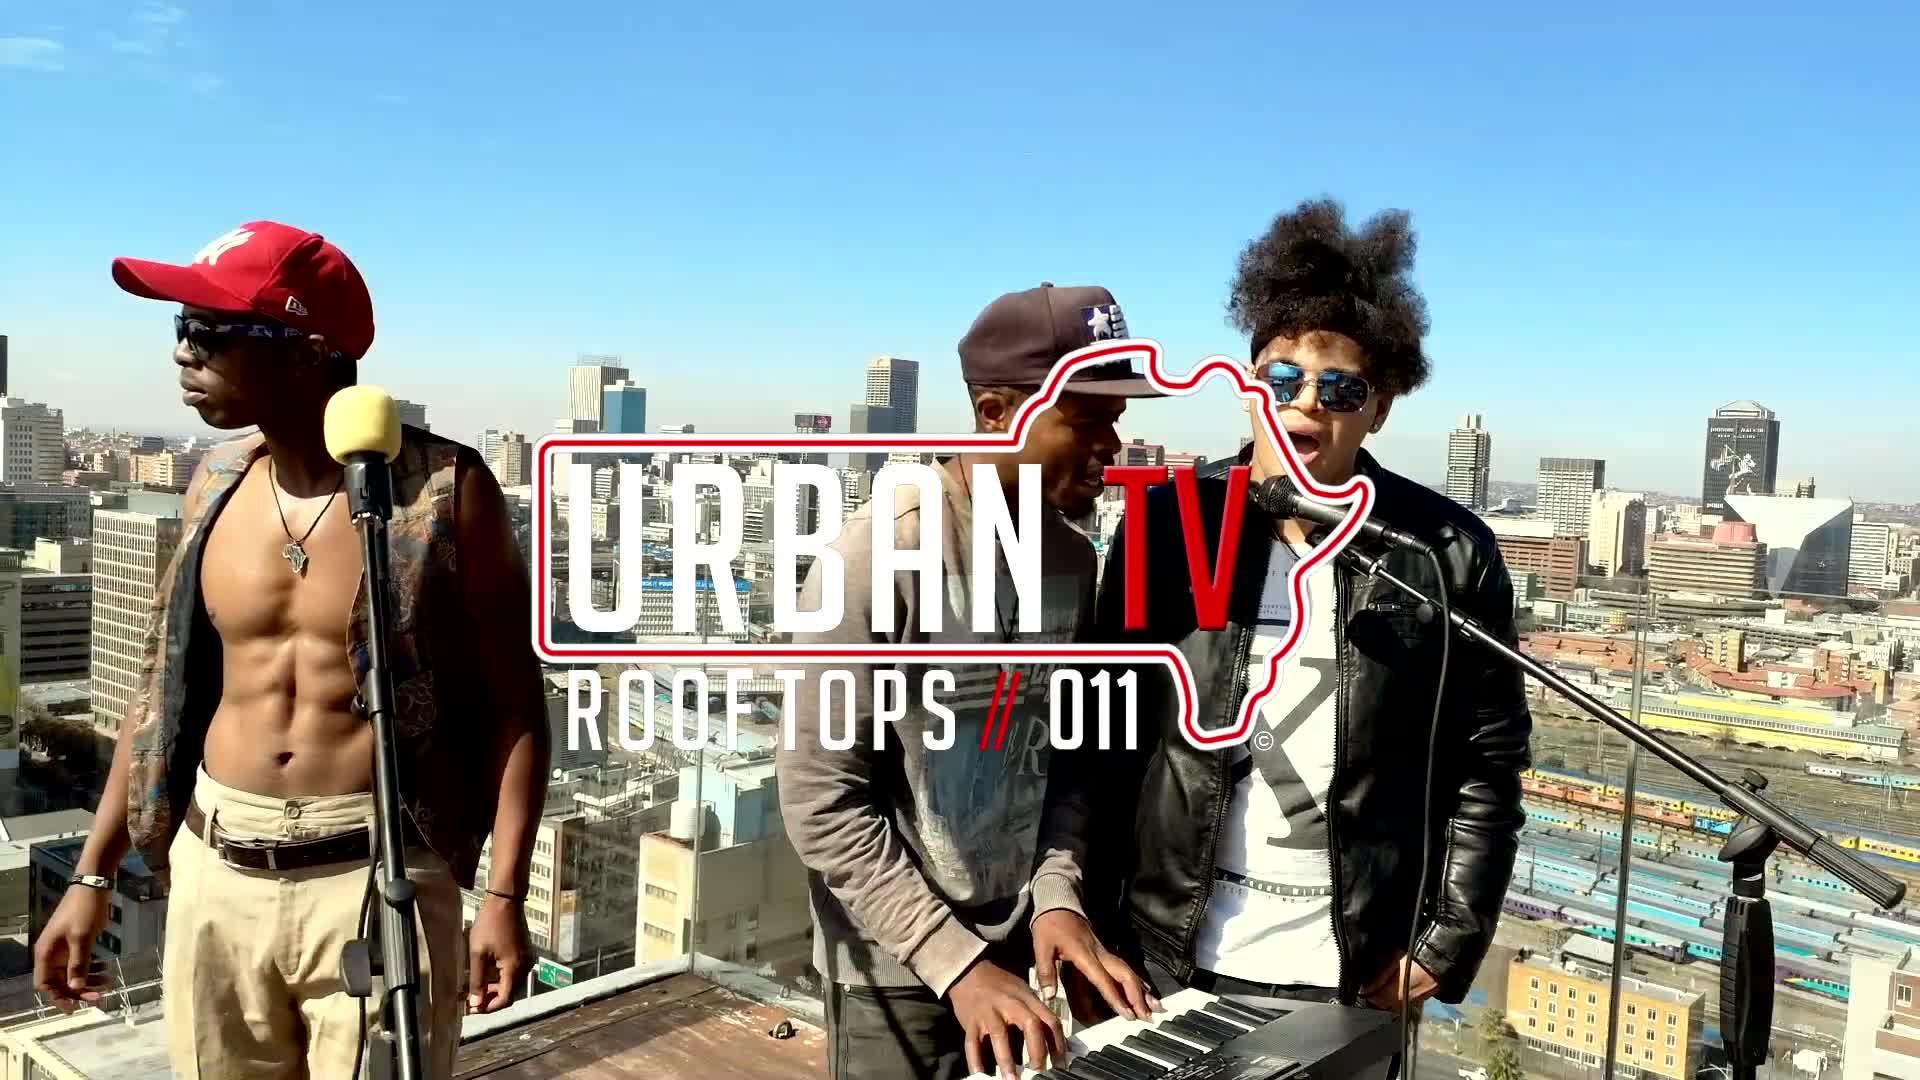 Urban Rooftops 011 - Oscar